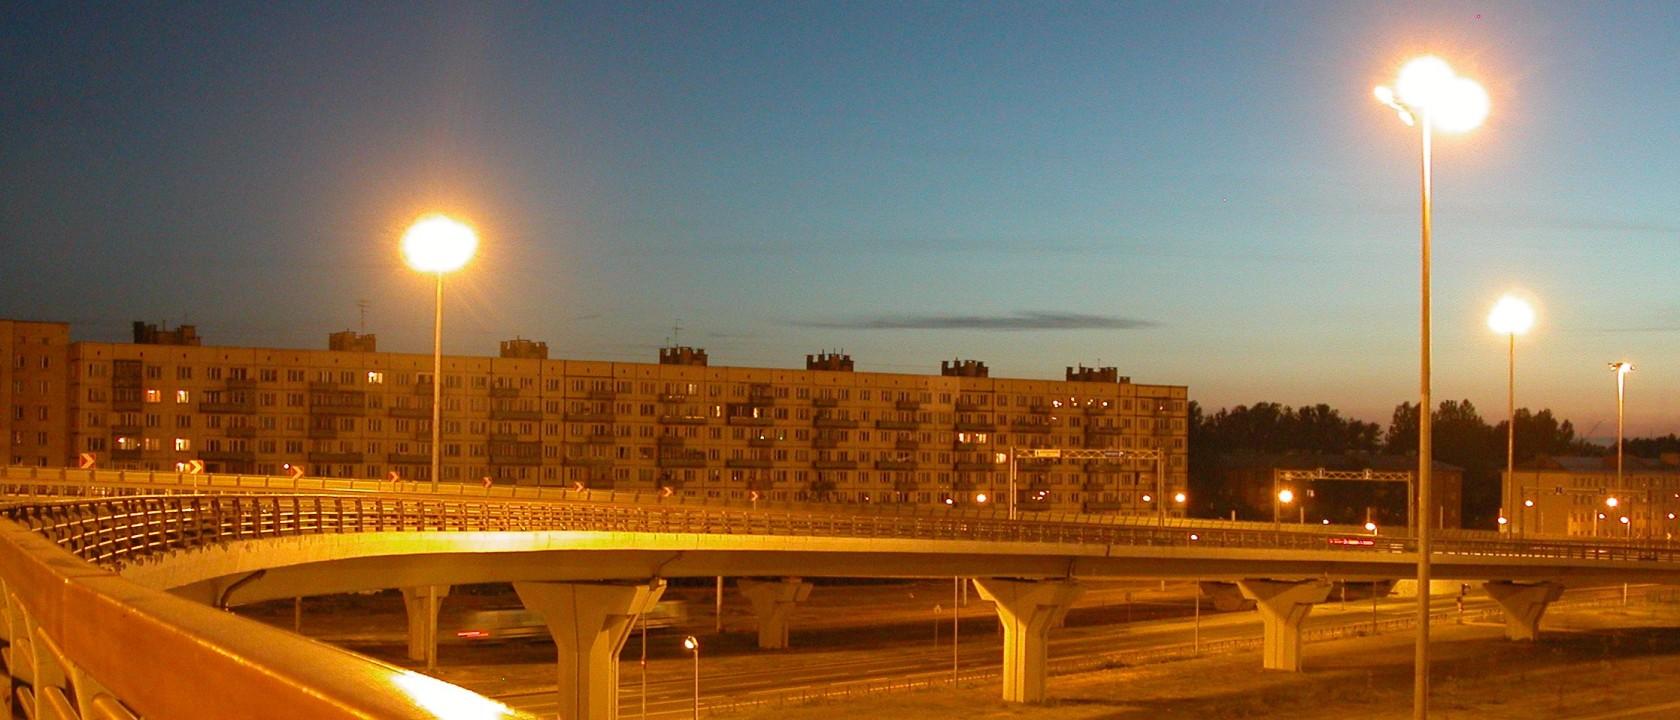 Russia Saint Peterburg Highmast Lighting (2) - Copy